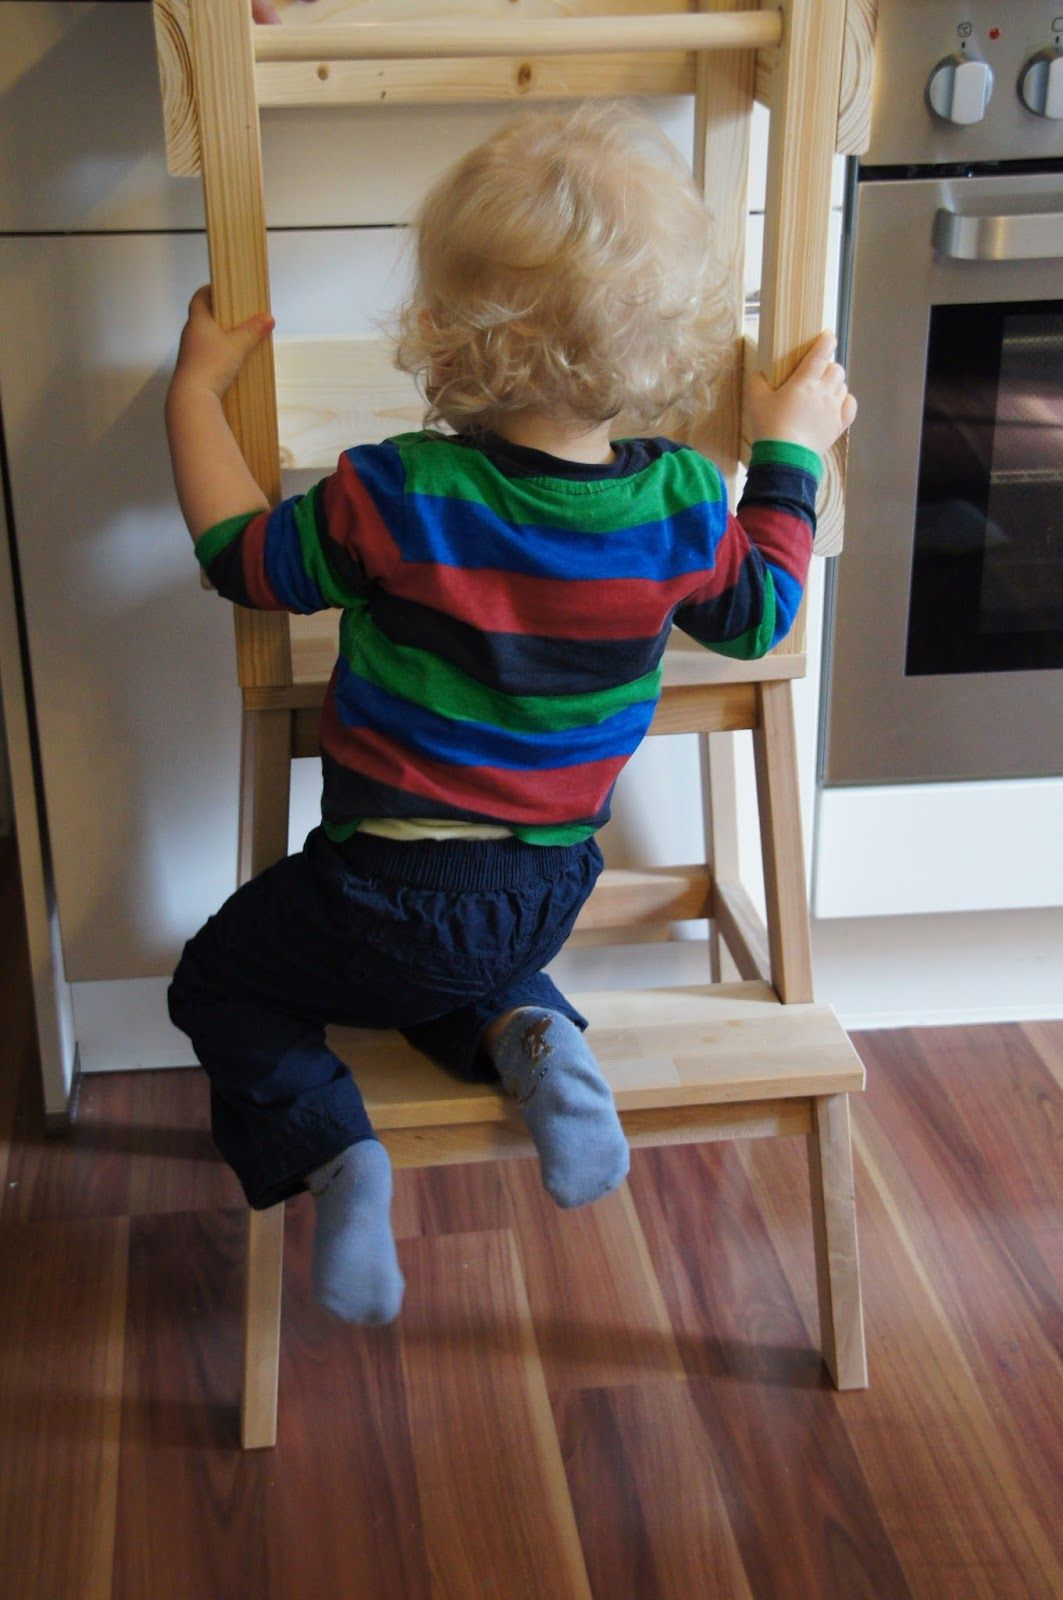 gl cksfl gel bauanleitung f r einen learning tower lernturm aus ikea hocker bekv m baby. Black Bedroom Furniture Sets. Home Design Ideas